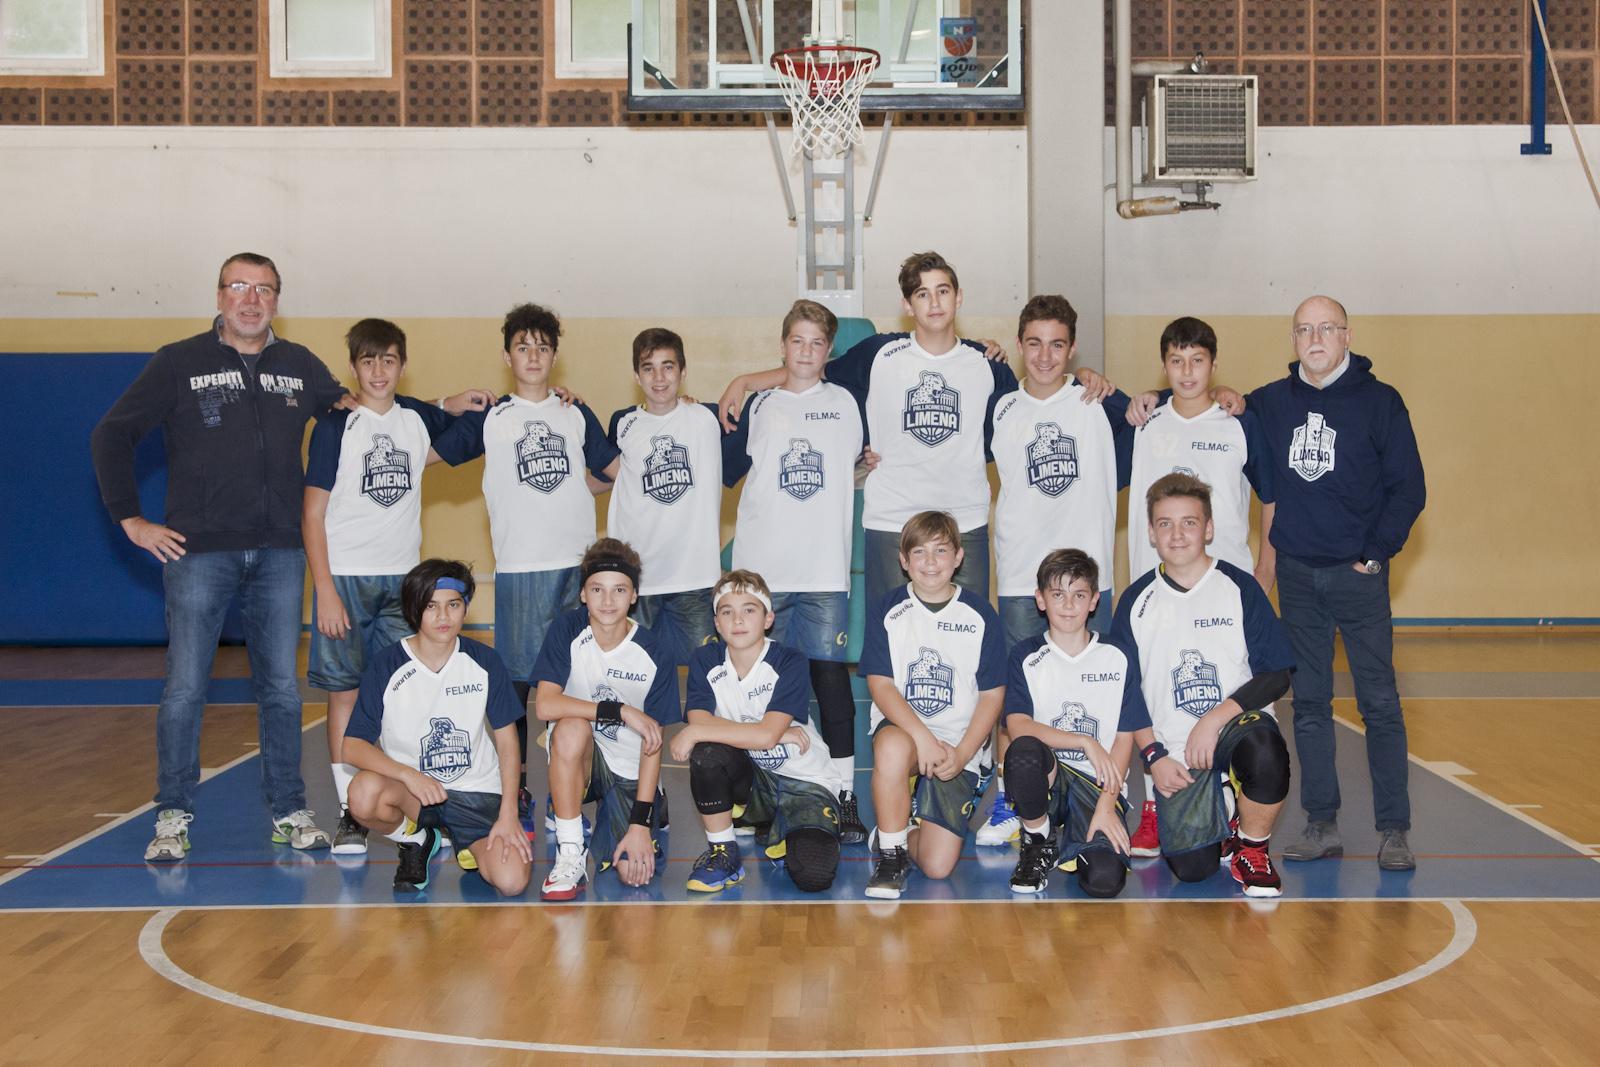 squadra_u14_2017-18-9461